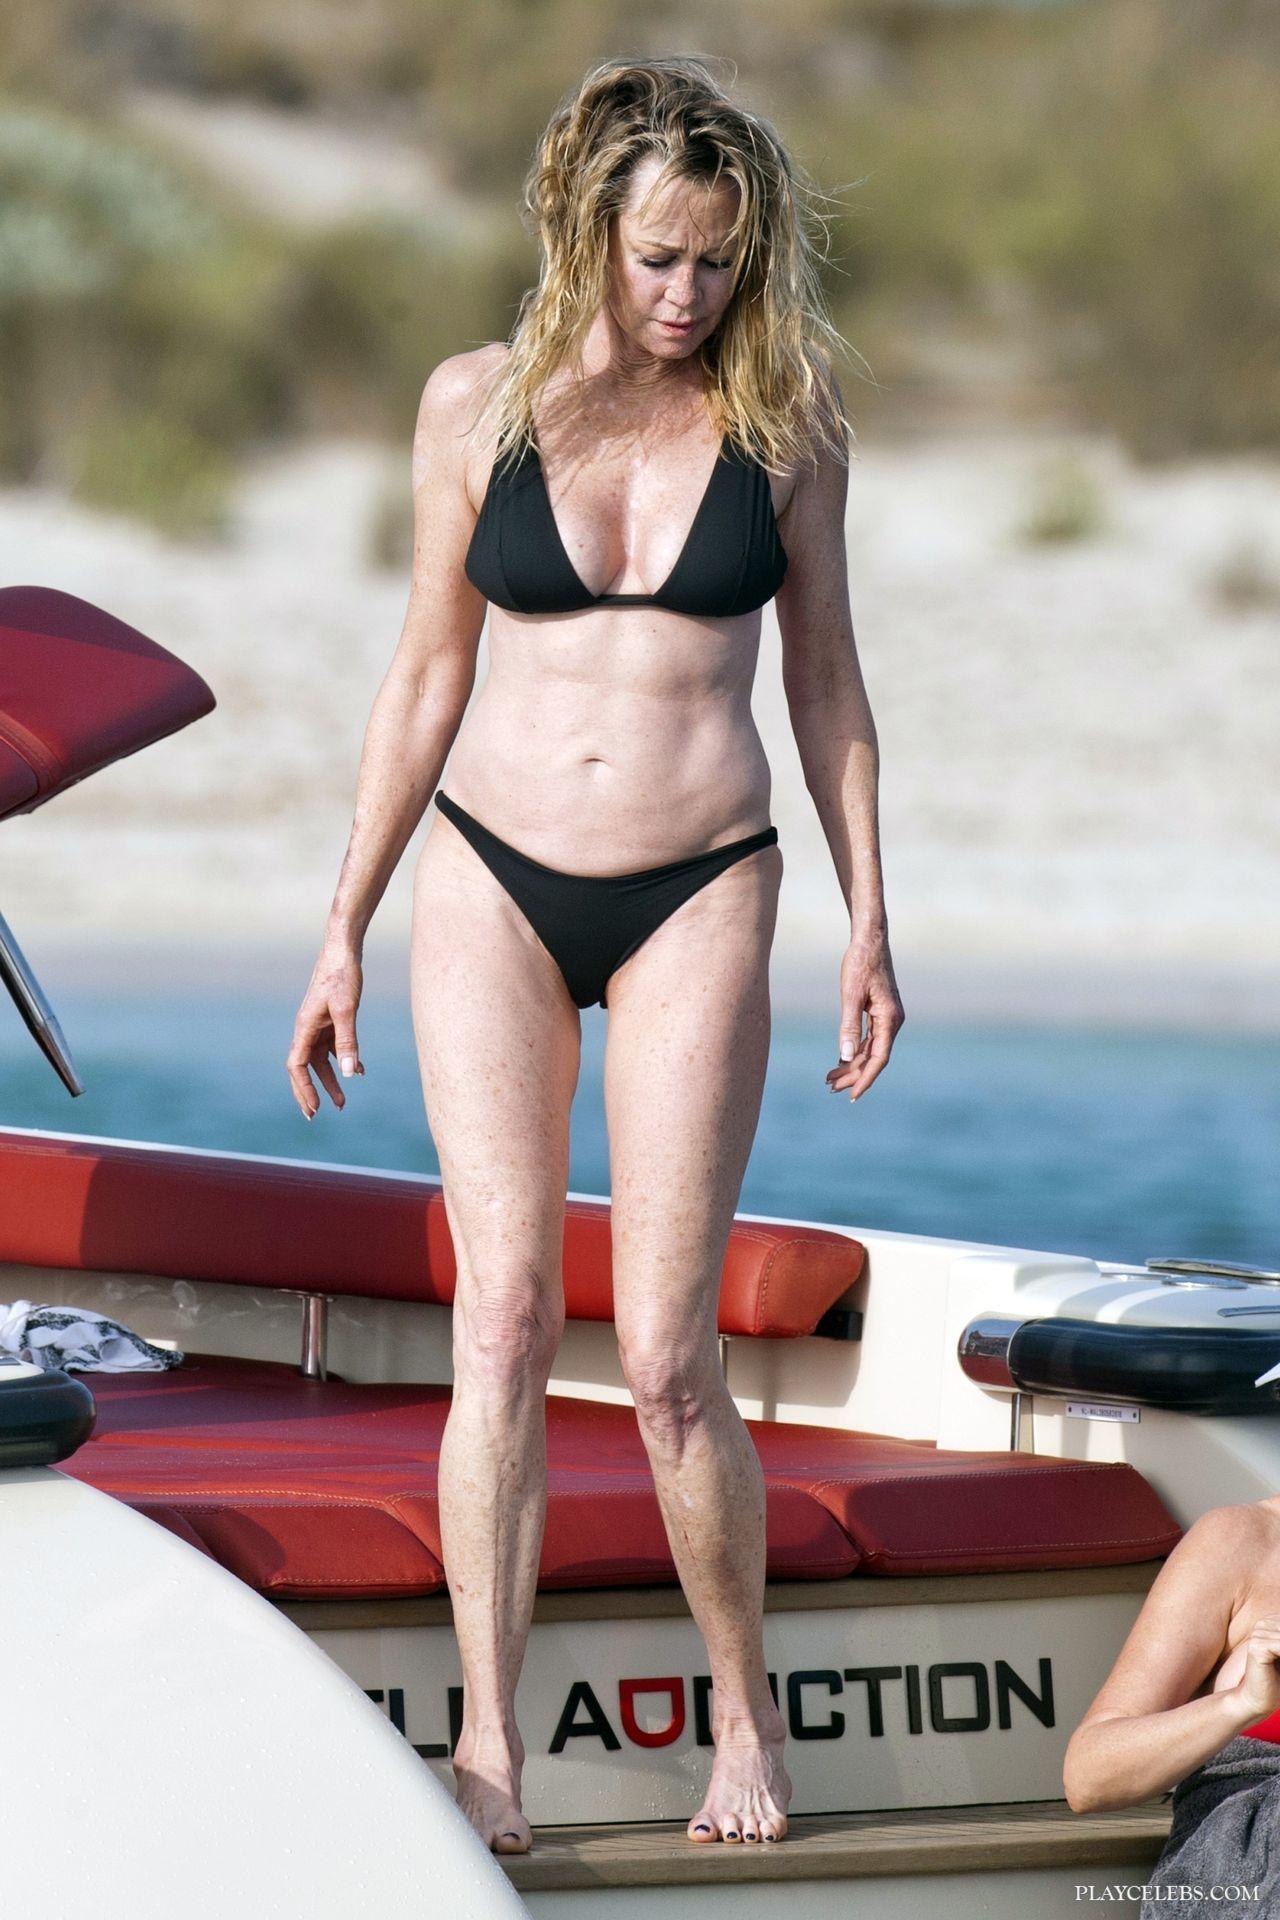 Melanie Griffith Caught By Paparazzi In Bikini On A Boach